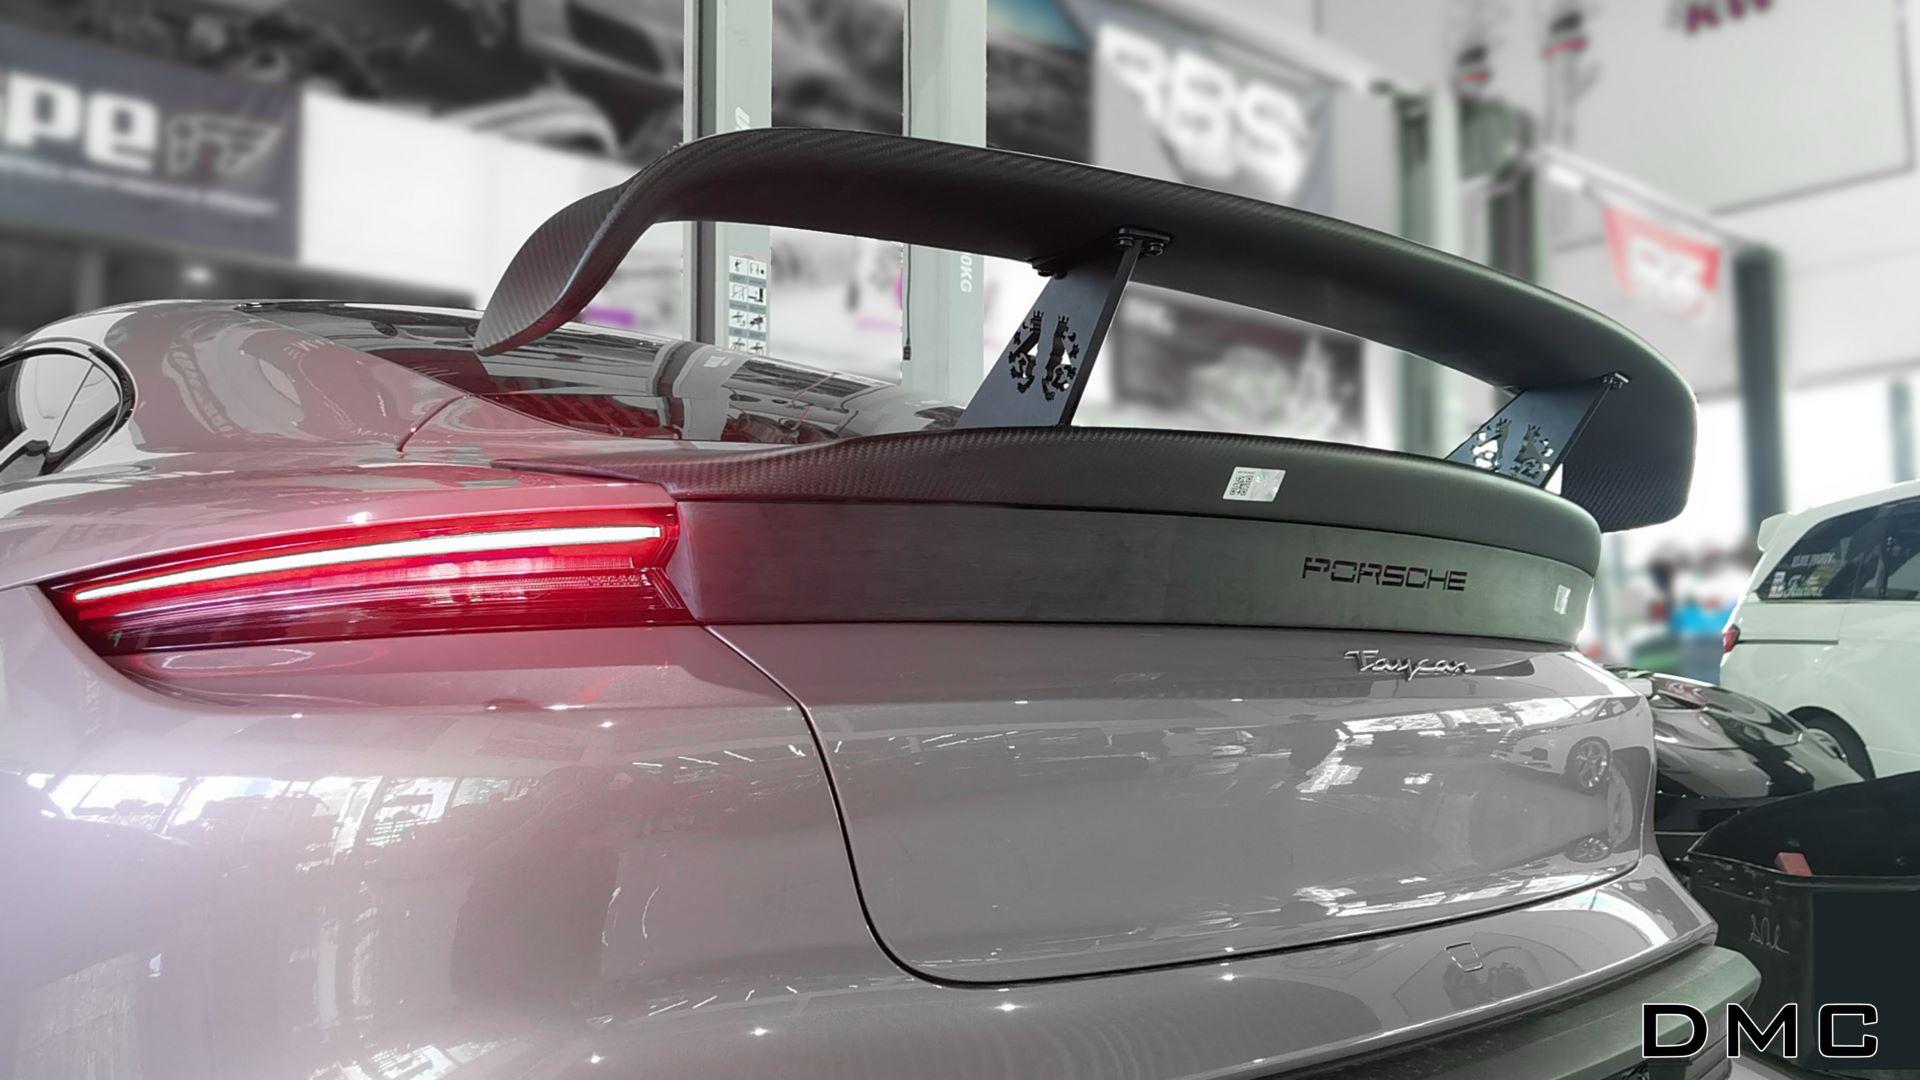 Porsche-Taycan-by-DMC-8